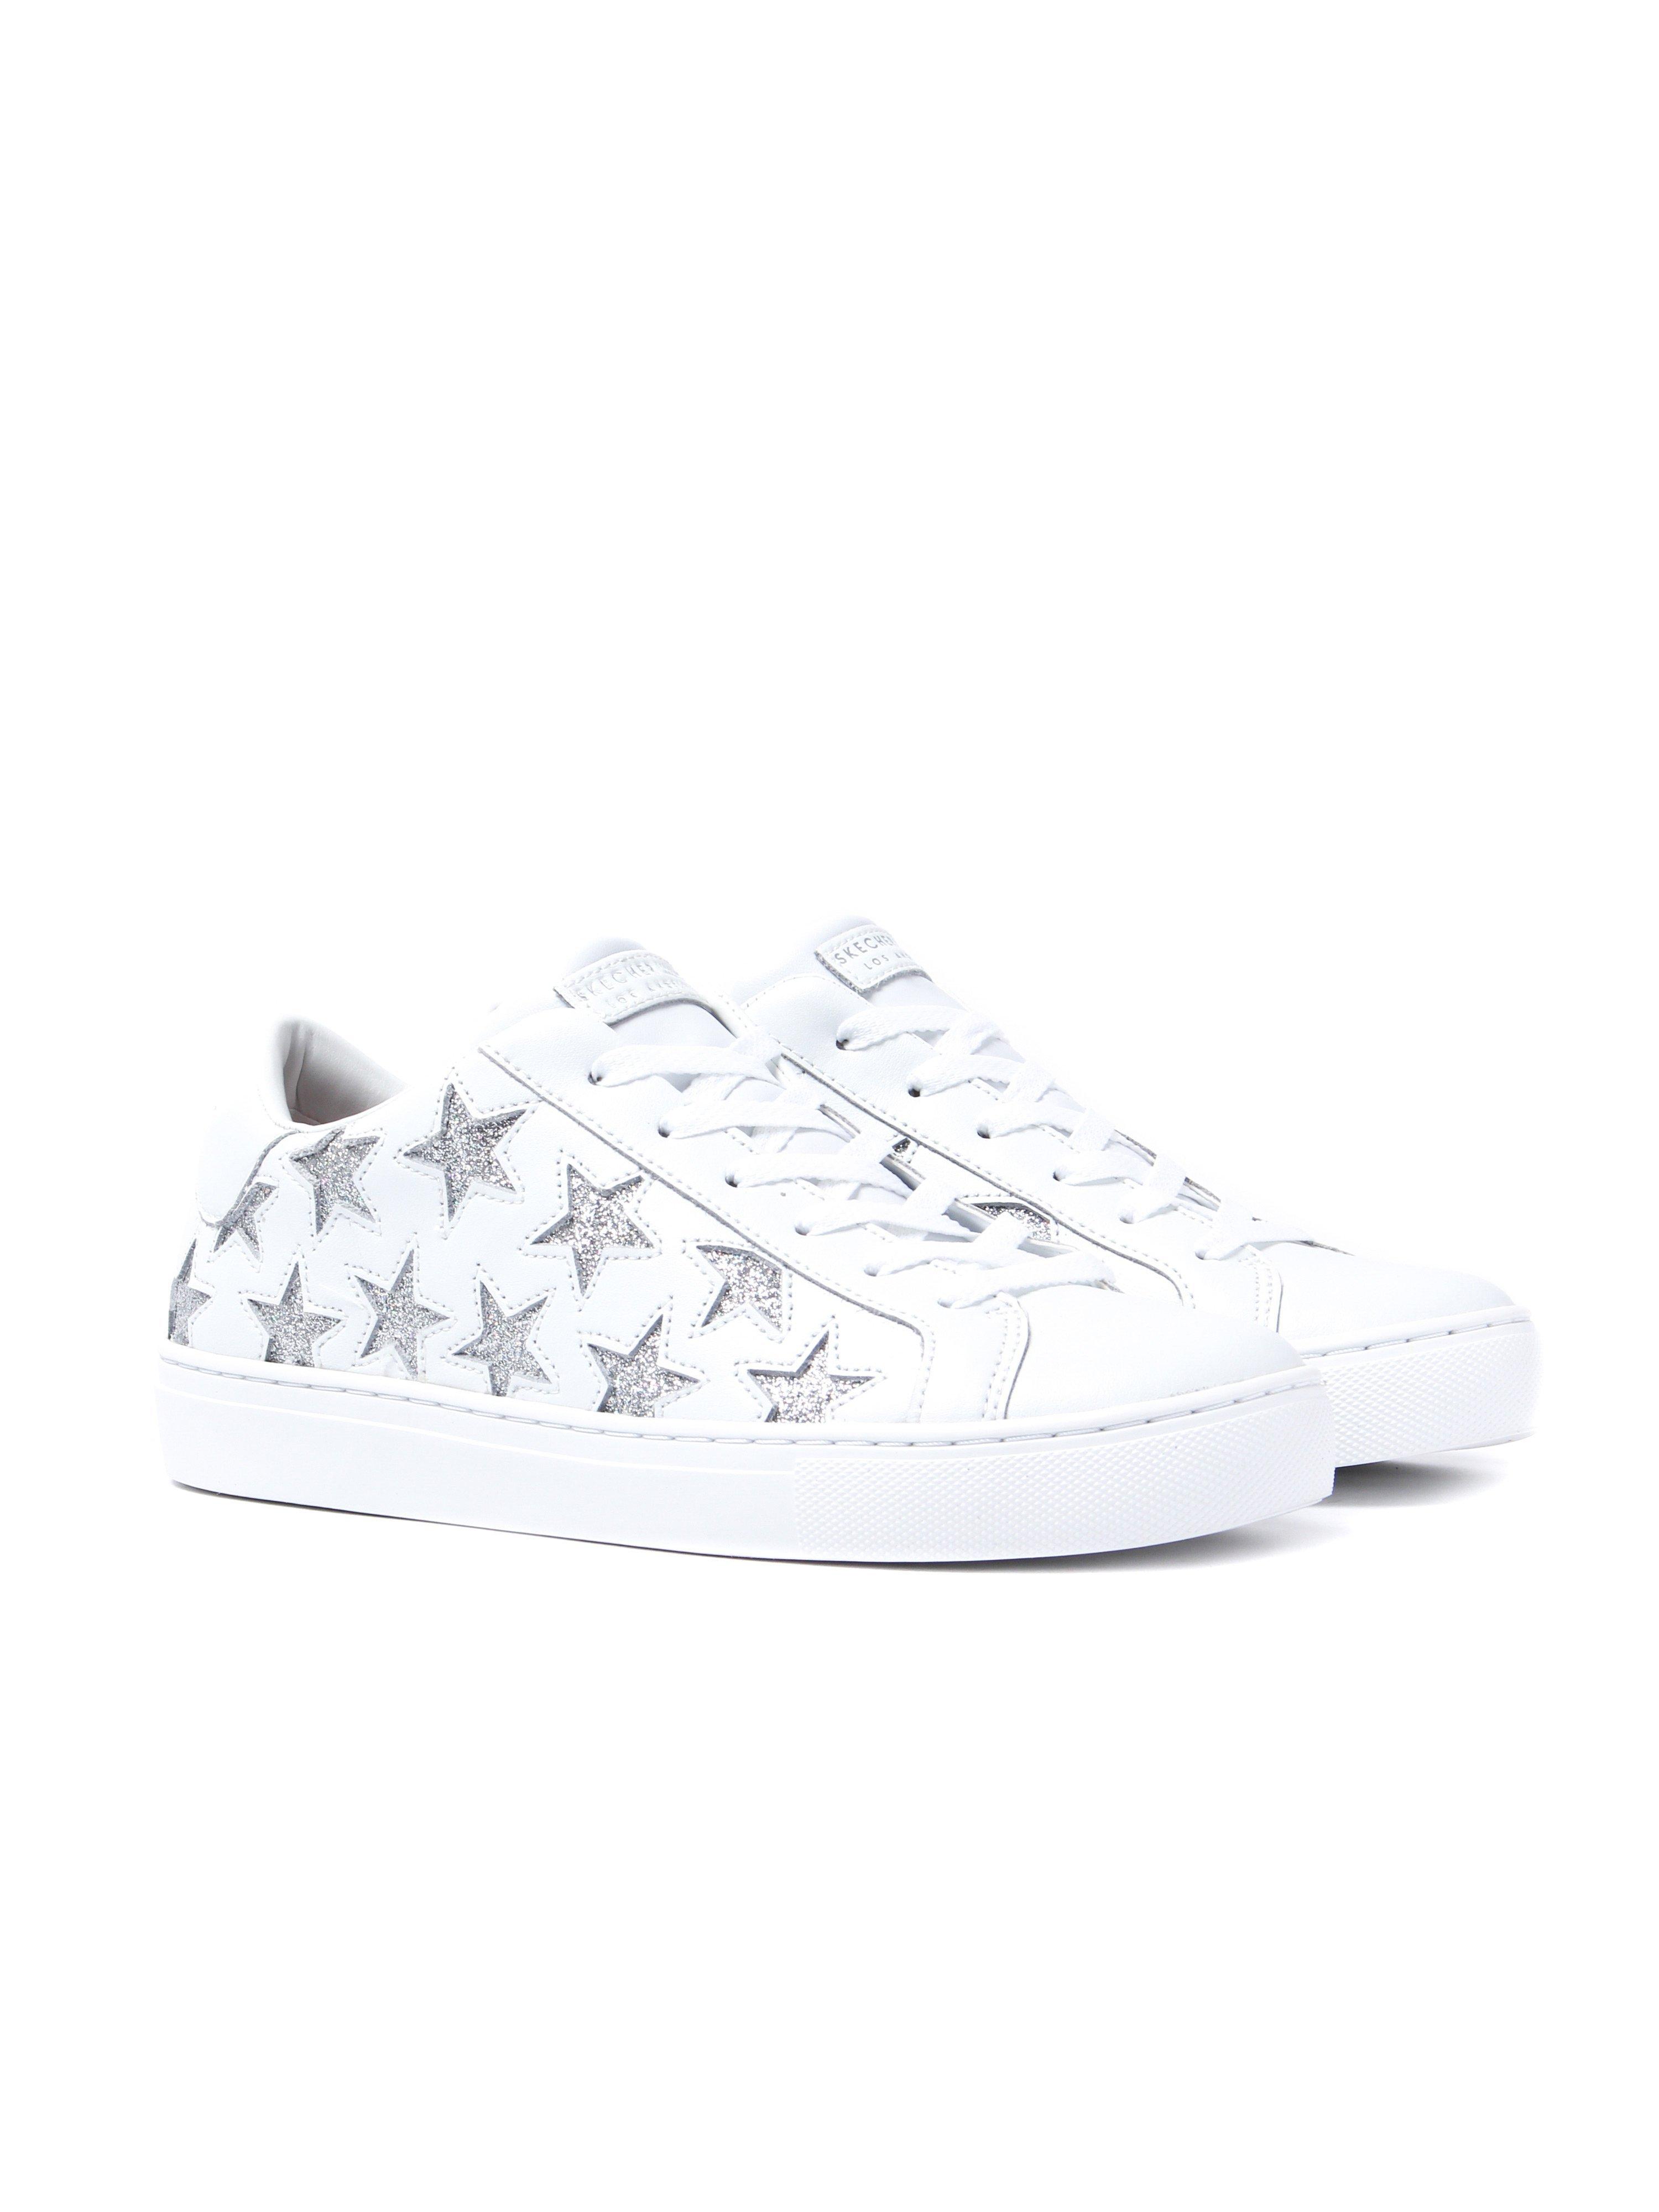 Skechers Women's Side Street Star Side Trainers - White/Silver Leather